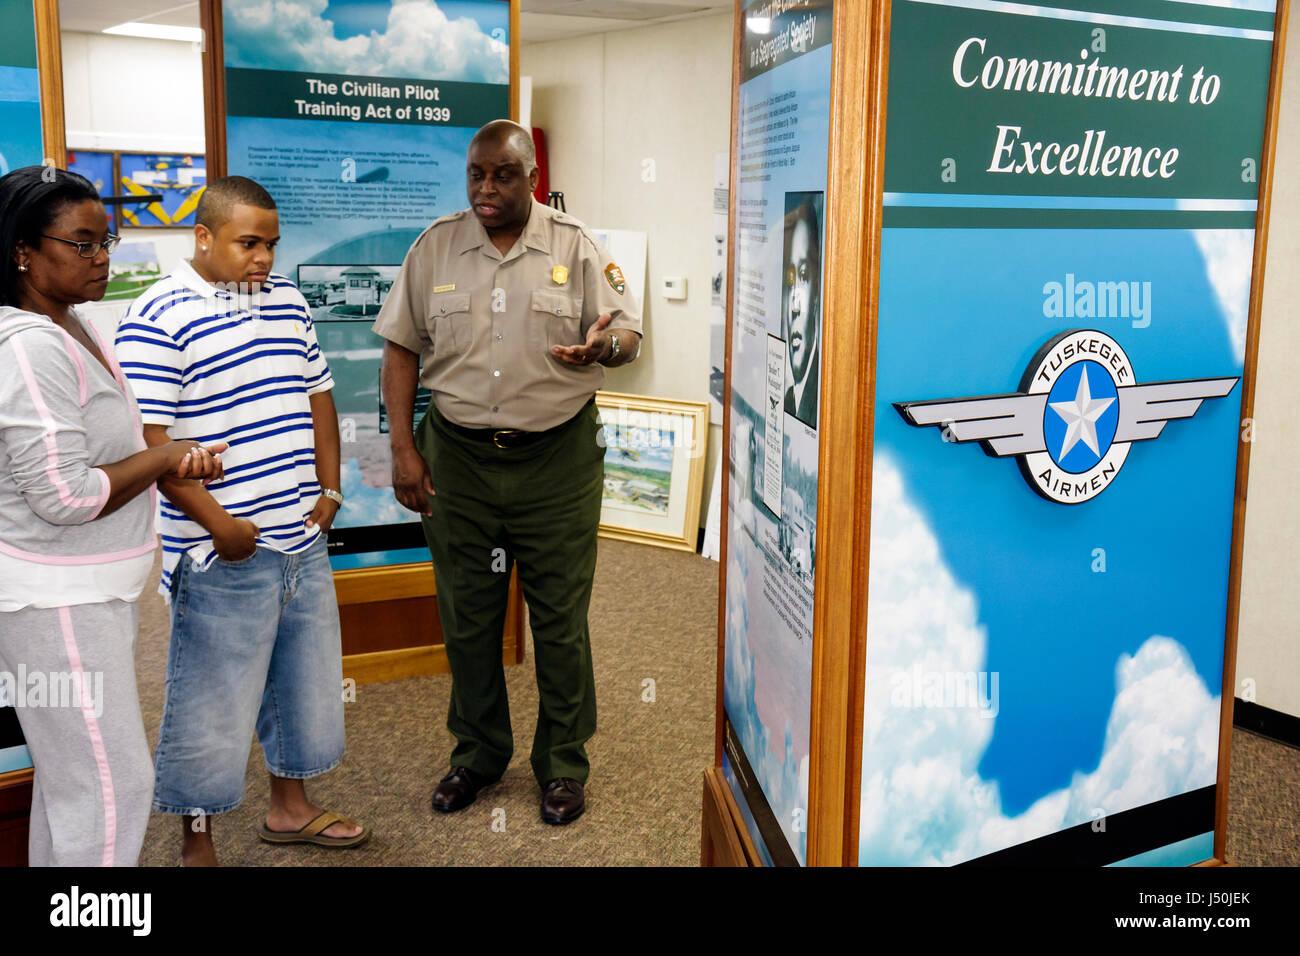 Alabama Tuskegee Black History Moton Airfield Tuskegee Airmen National Historic Site Black man guide ranger woman - Stock Image